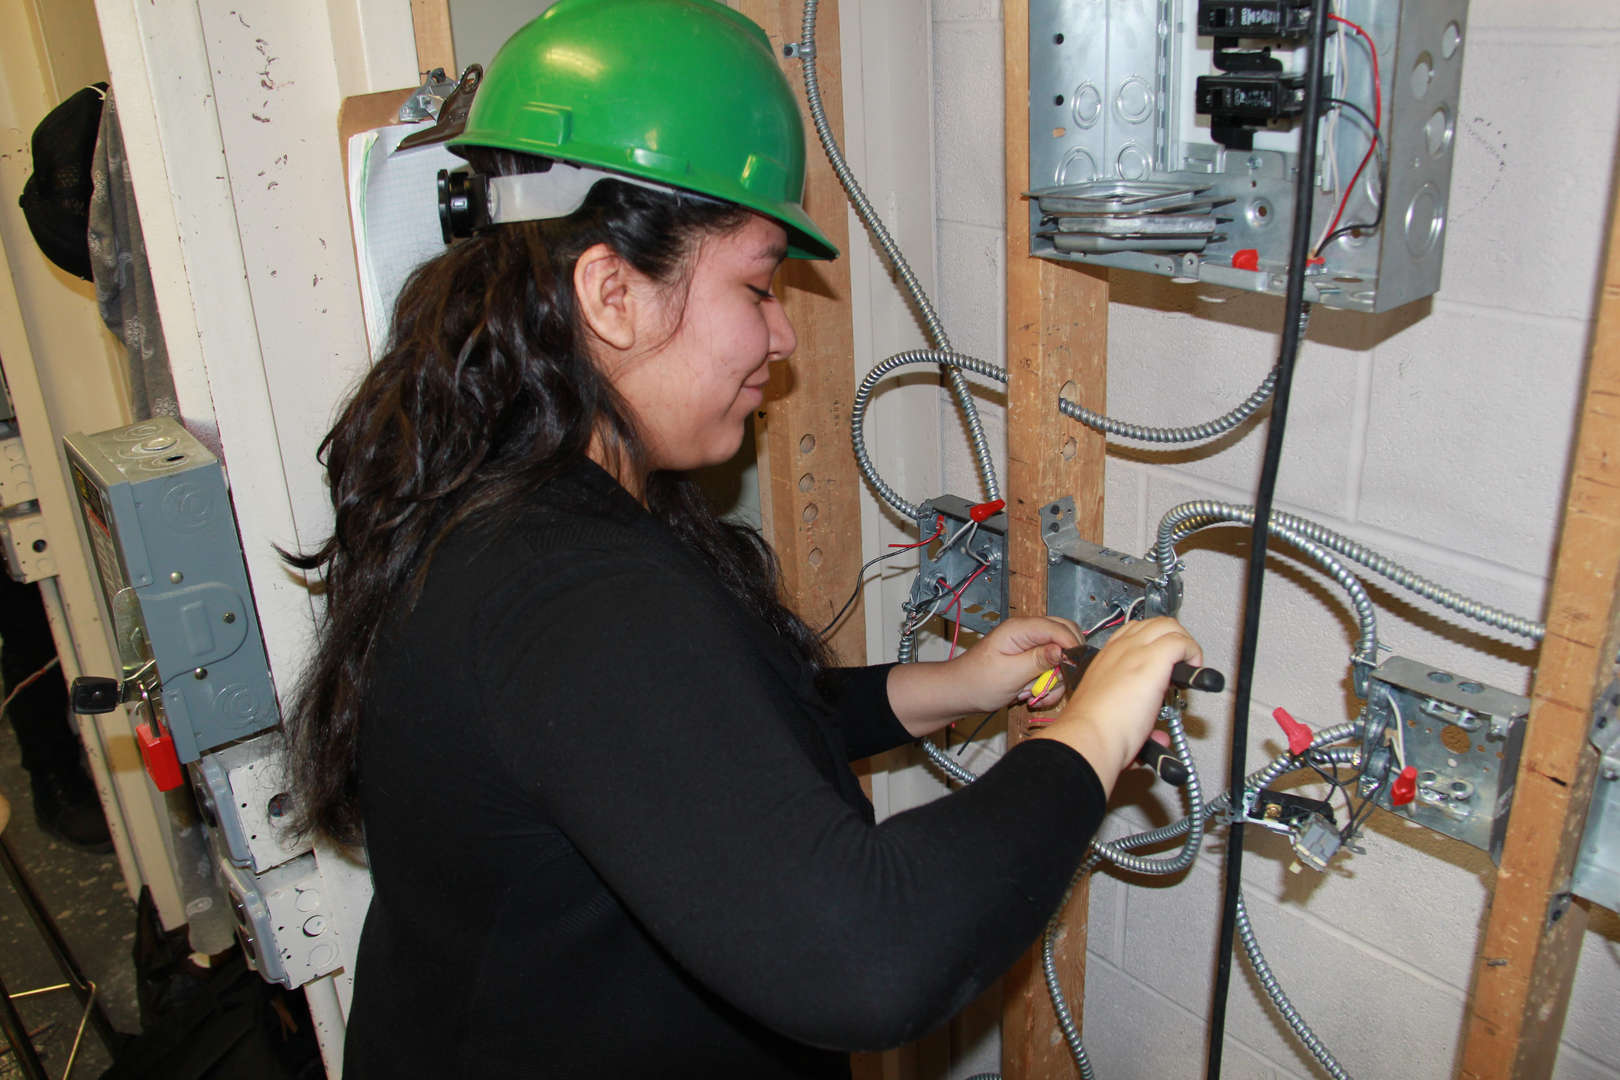 Student installing wiring